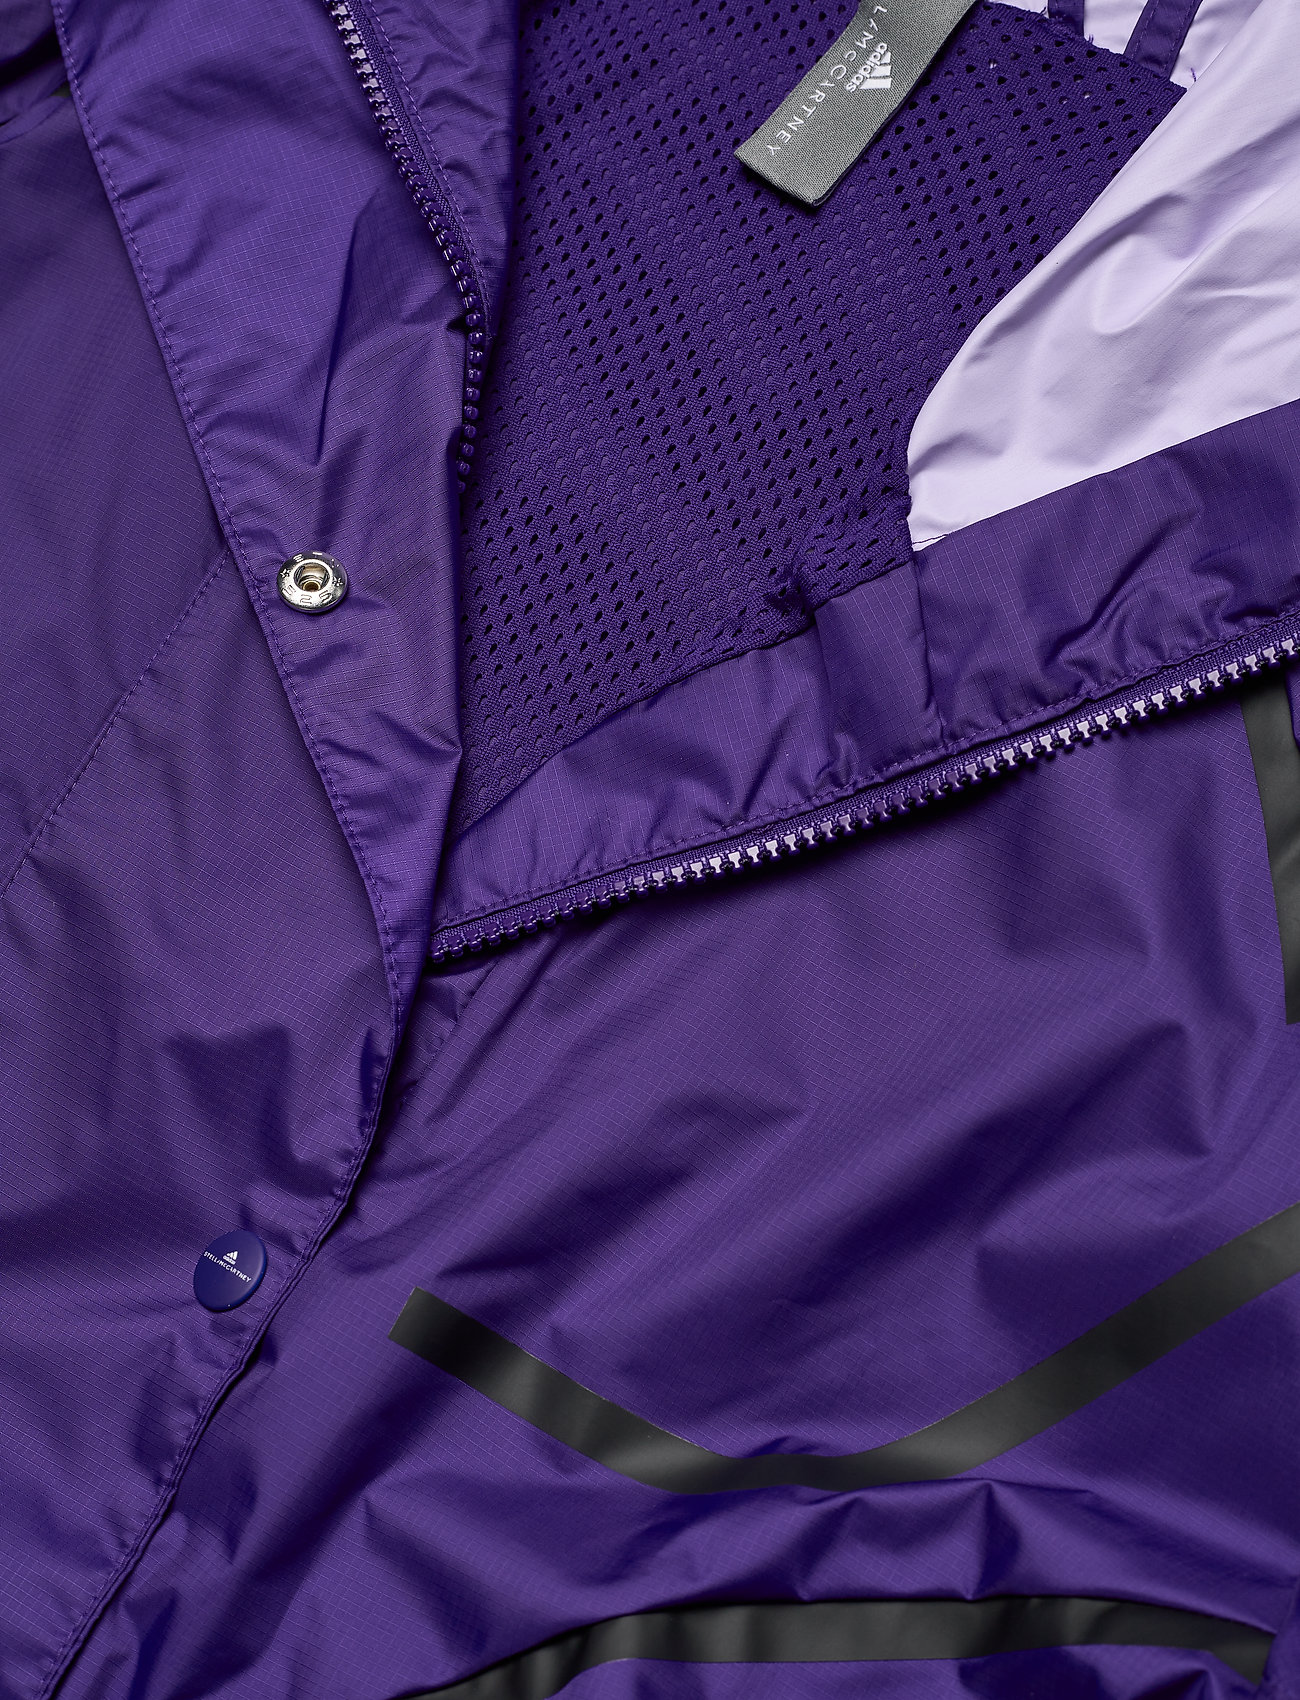 adidas by Stella McCartney - TRUEPACE JKT - training jackets - cpurpl - 5